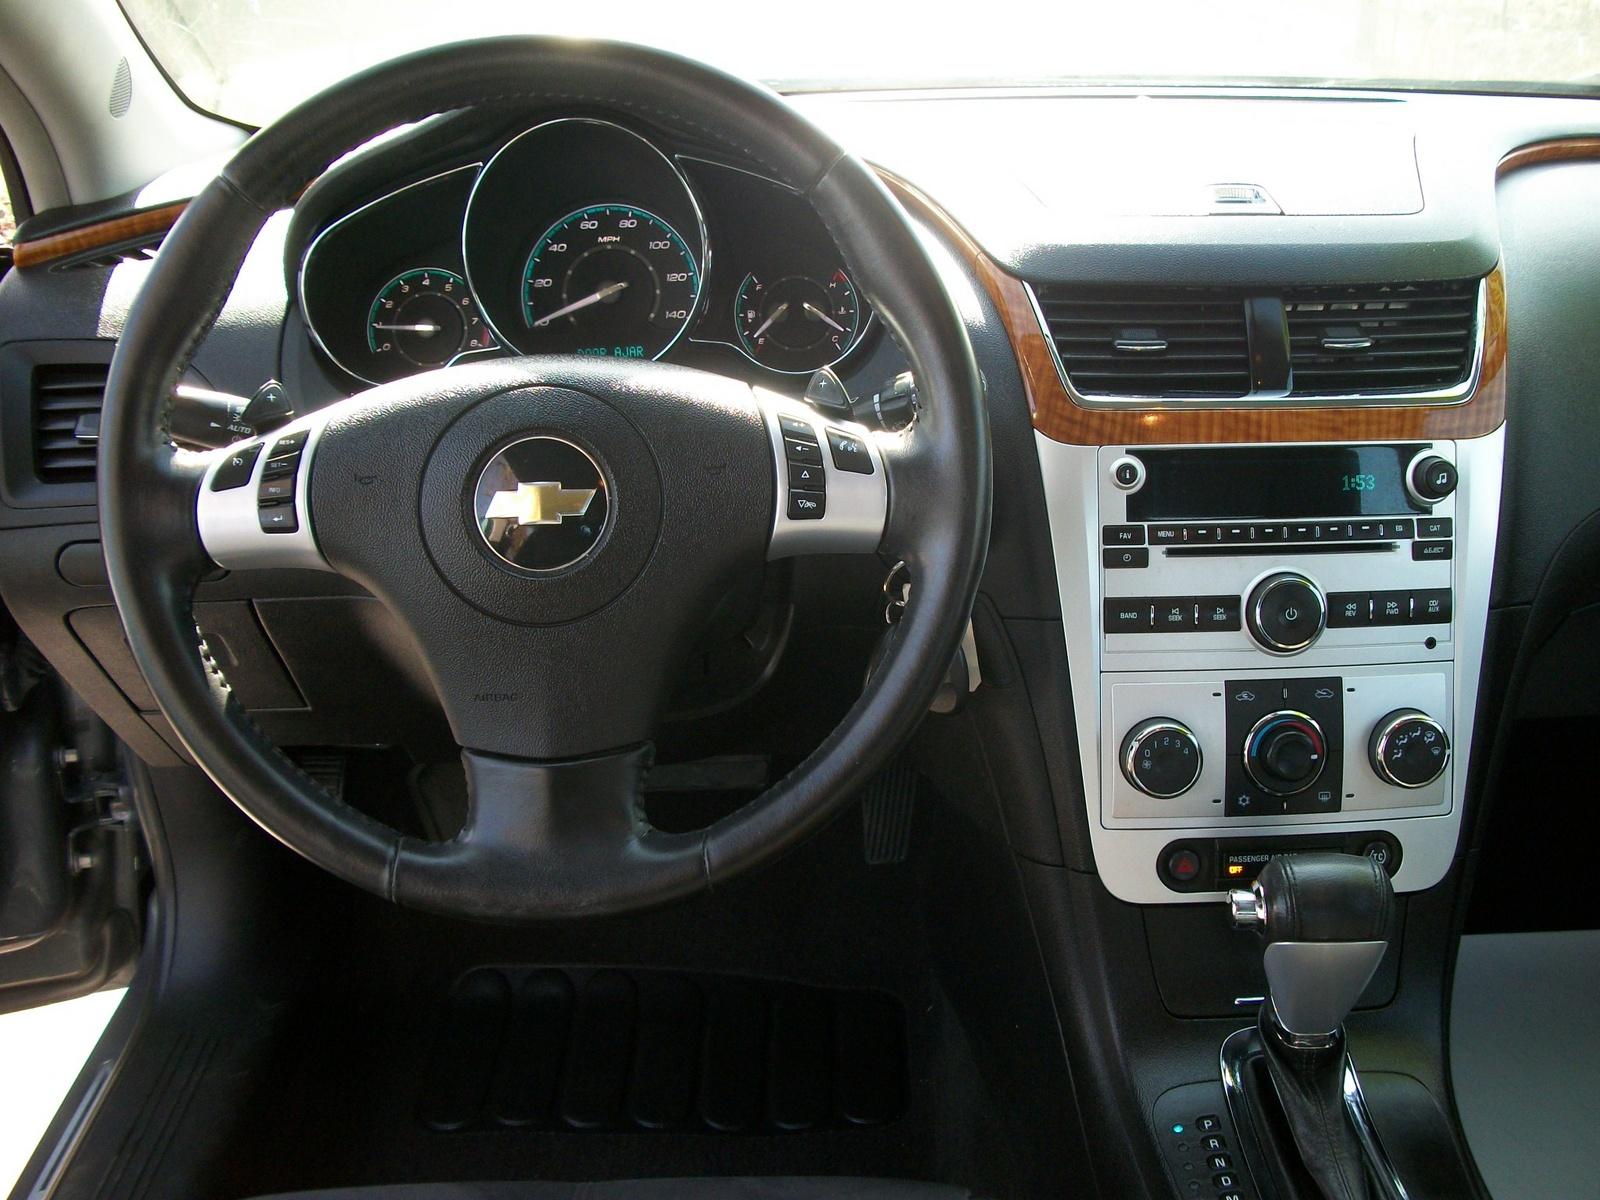 2009 Chevrolet Malibu Interior 2009 Chevy Malibu Interior